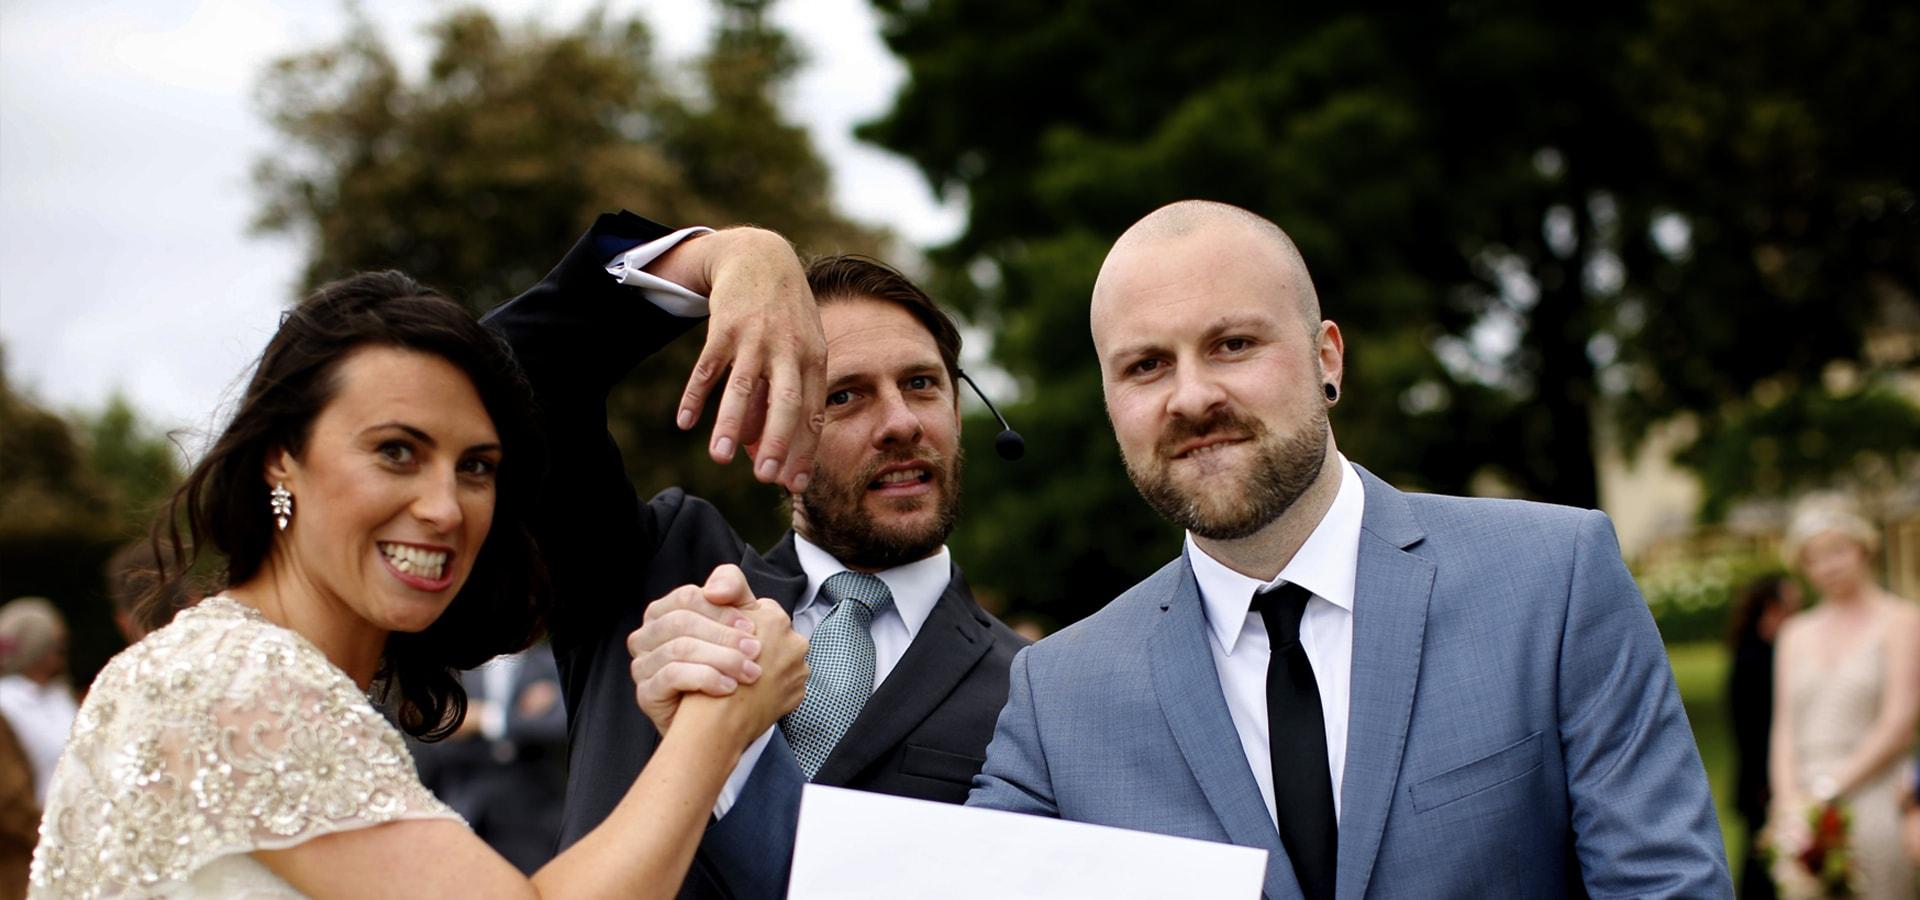 Benny Roff - Melbourne Marriage Celebrant